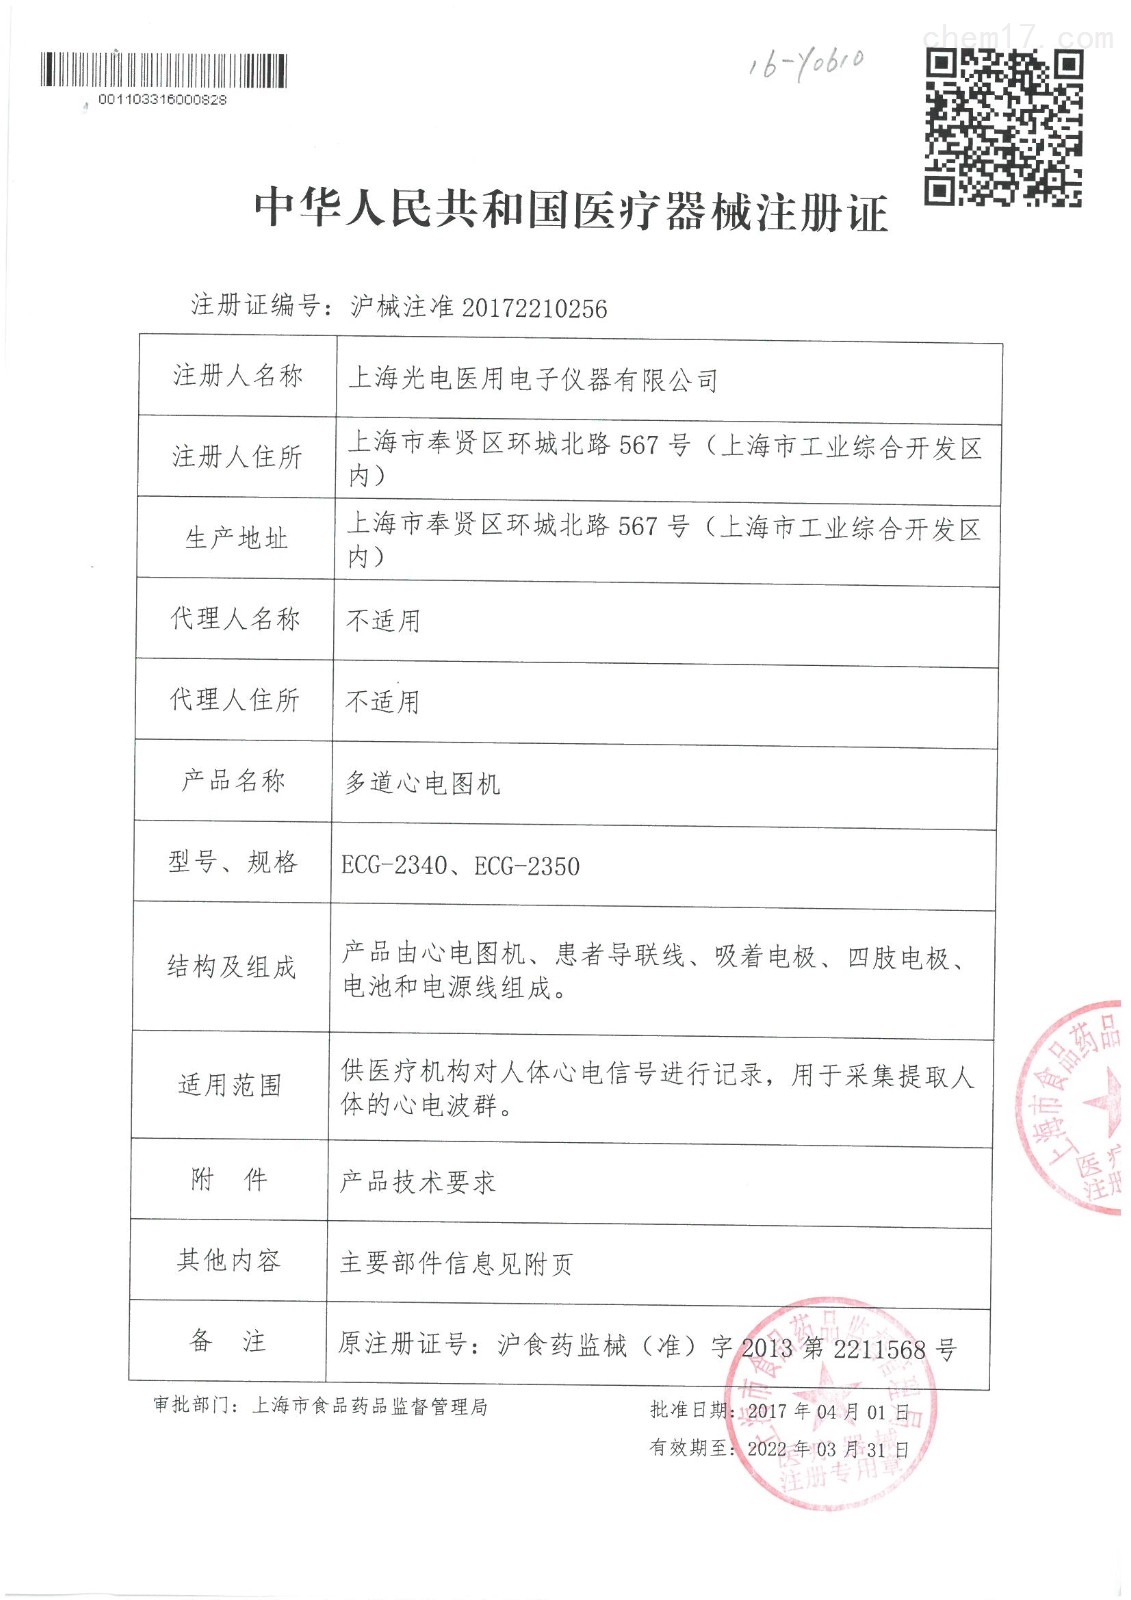 ECG-2350型注册证.jpg